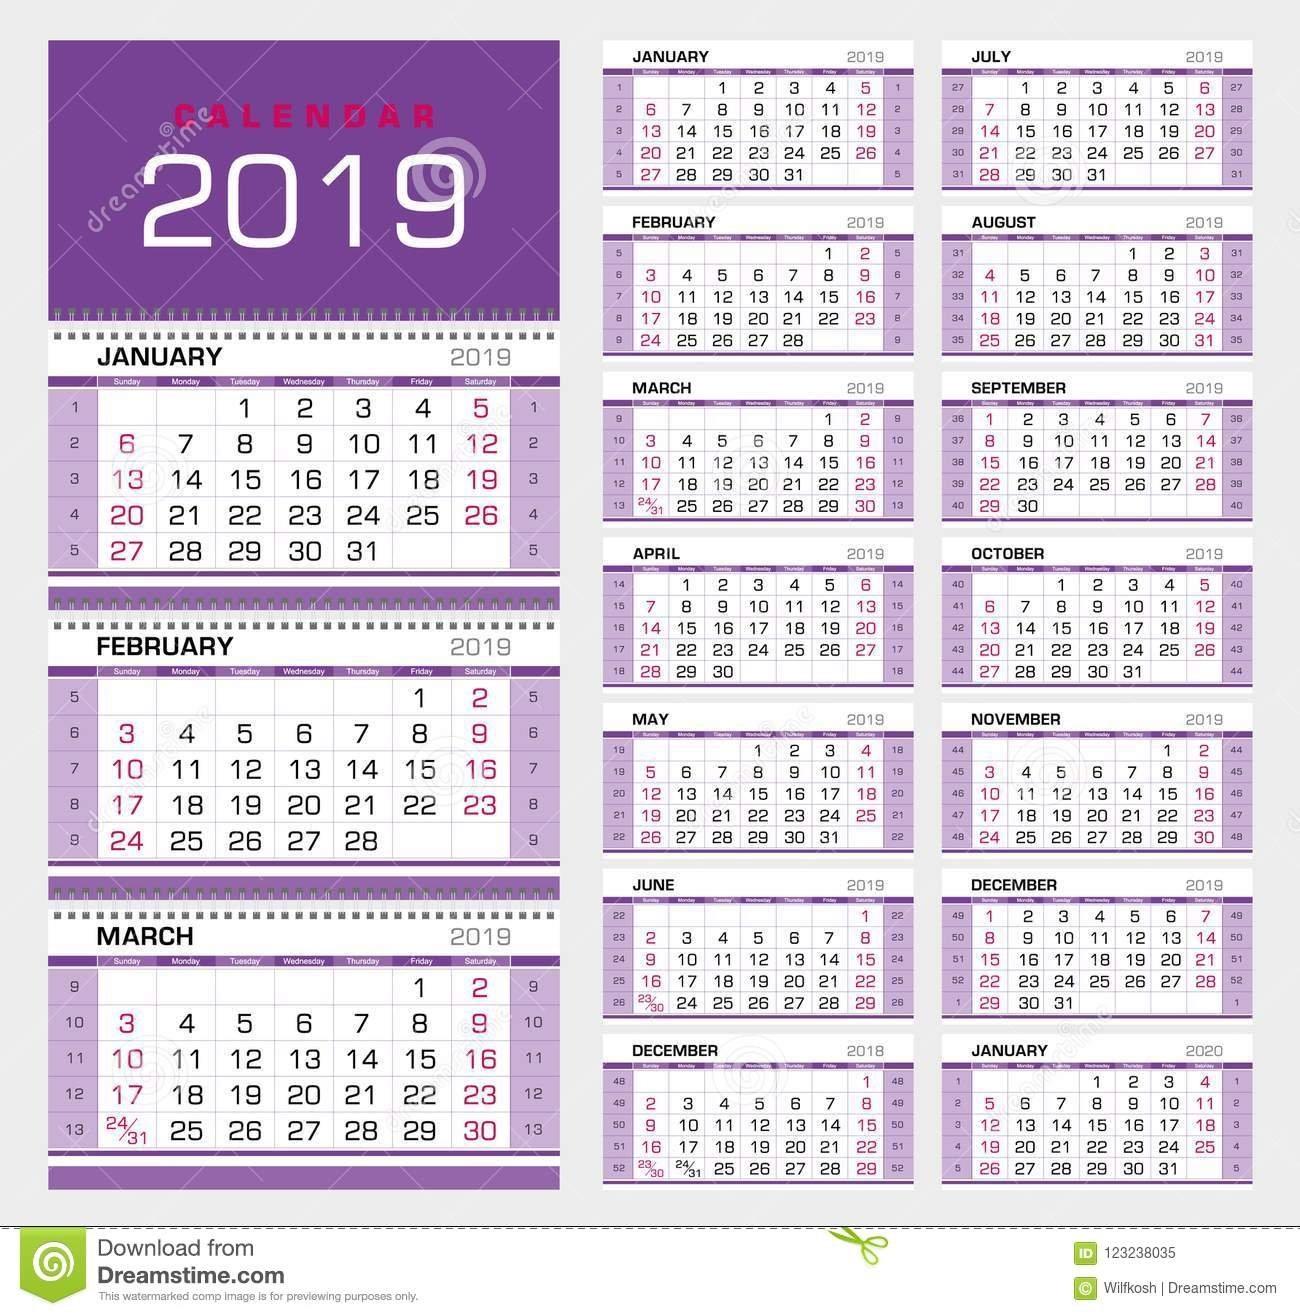 Wall Quarterly Calendar 2019 With Week Numbers. Week Start From Calendar Week 51 2019